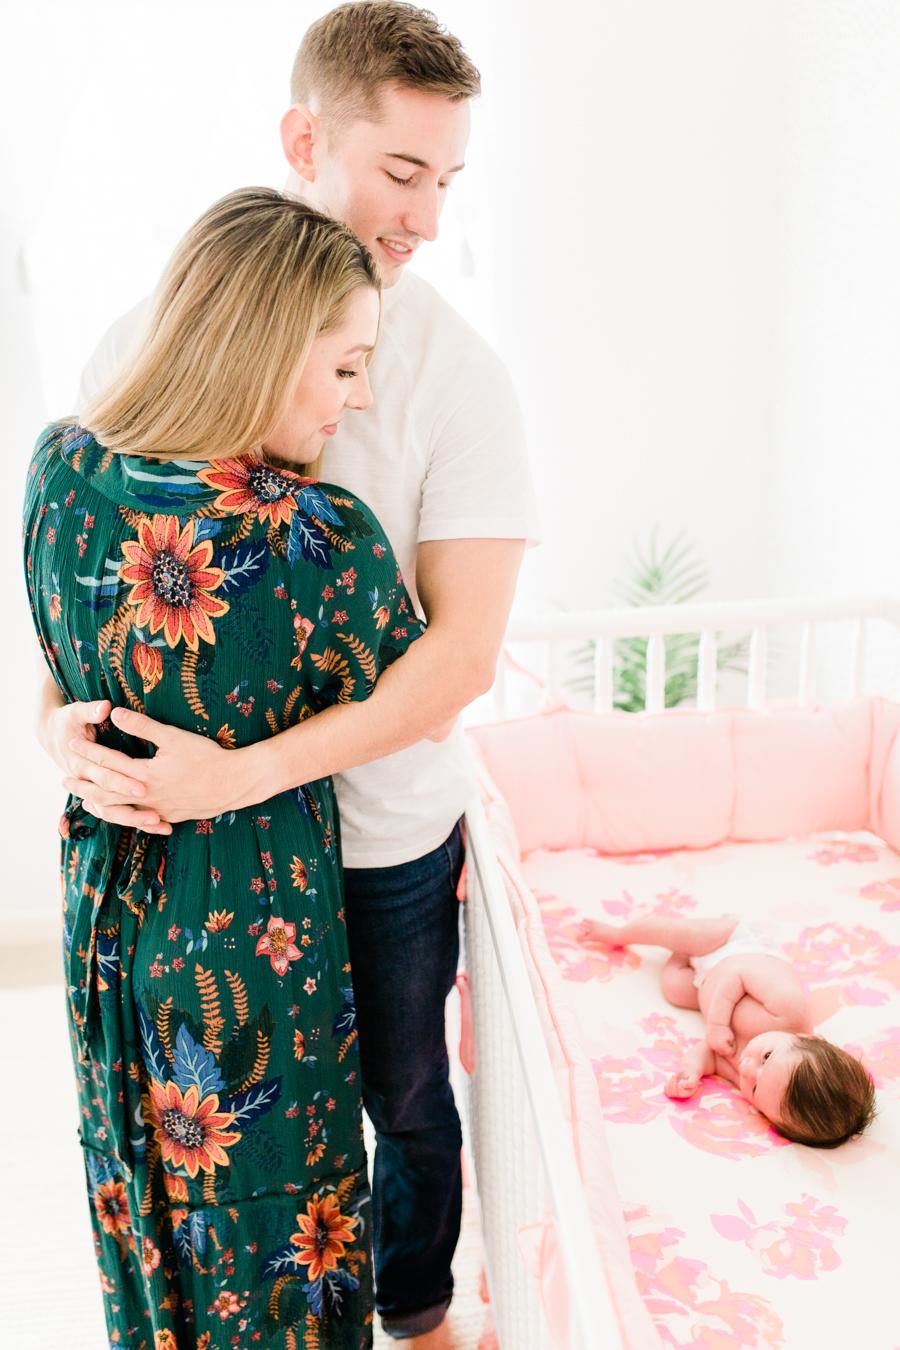 newborn_photographer_houston_texas16.jpg